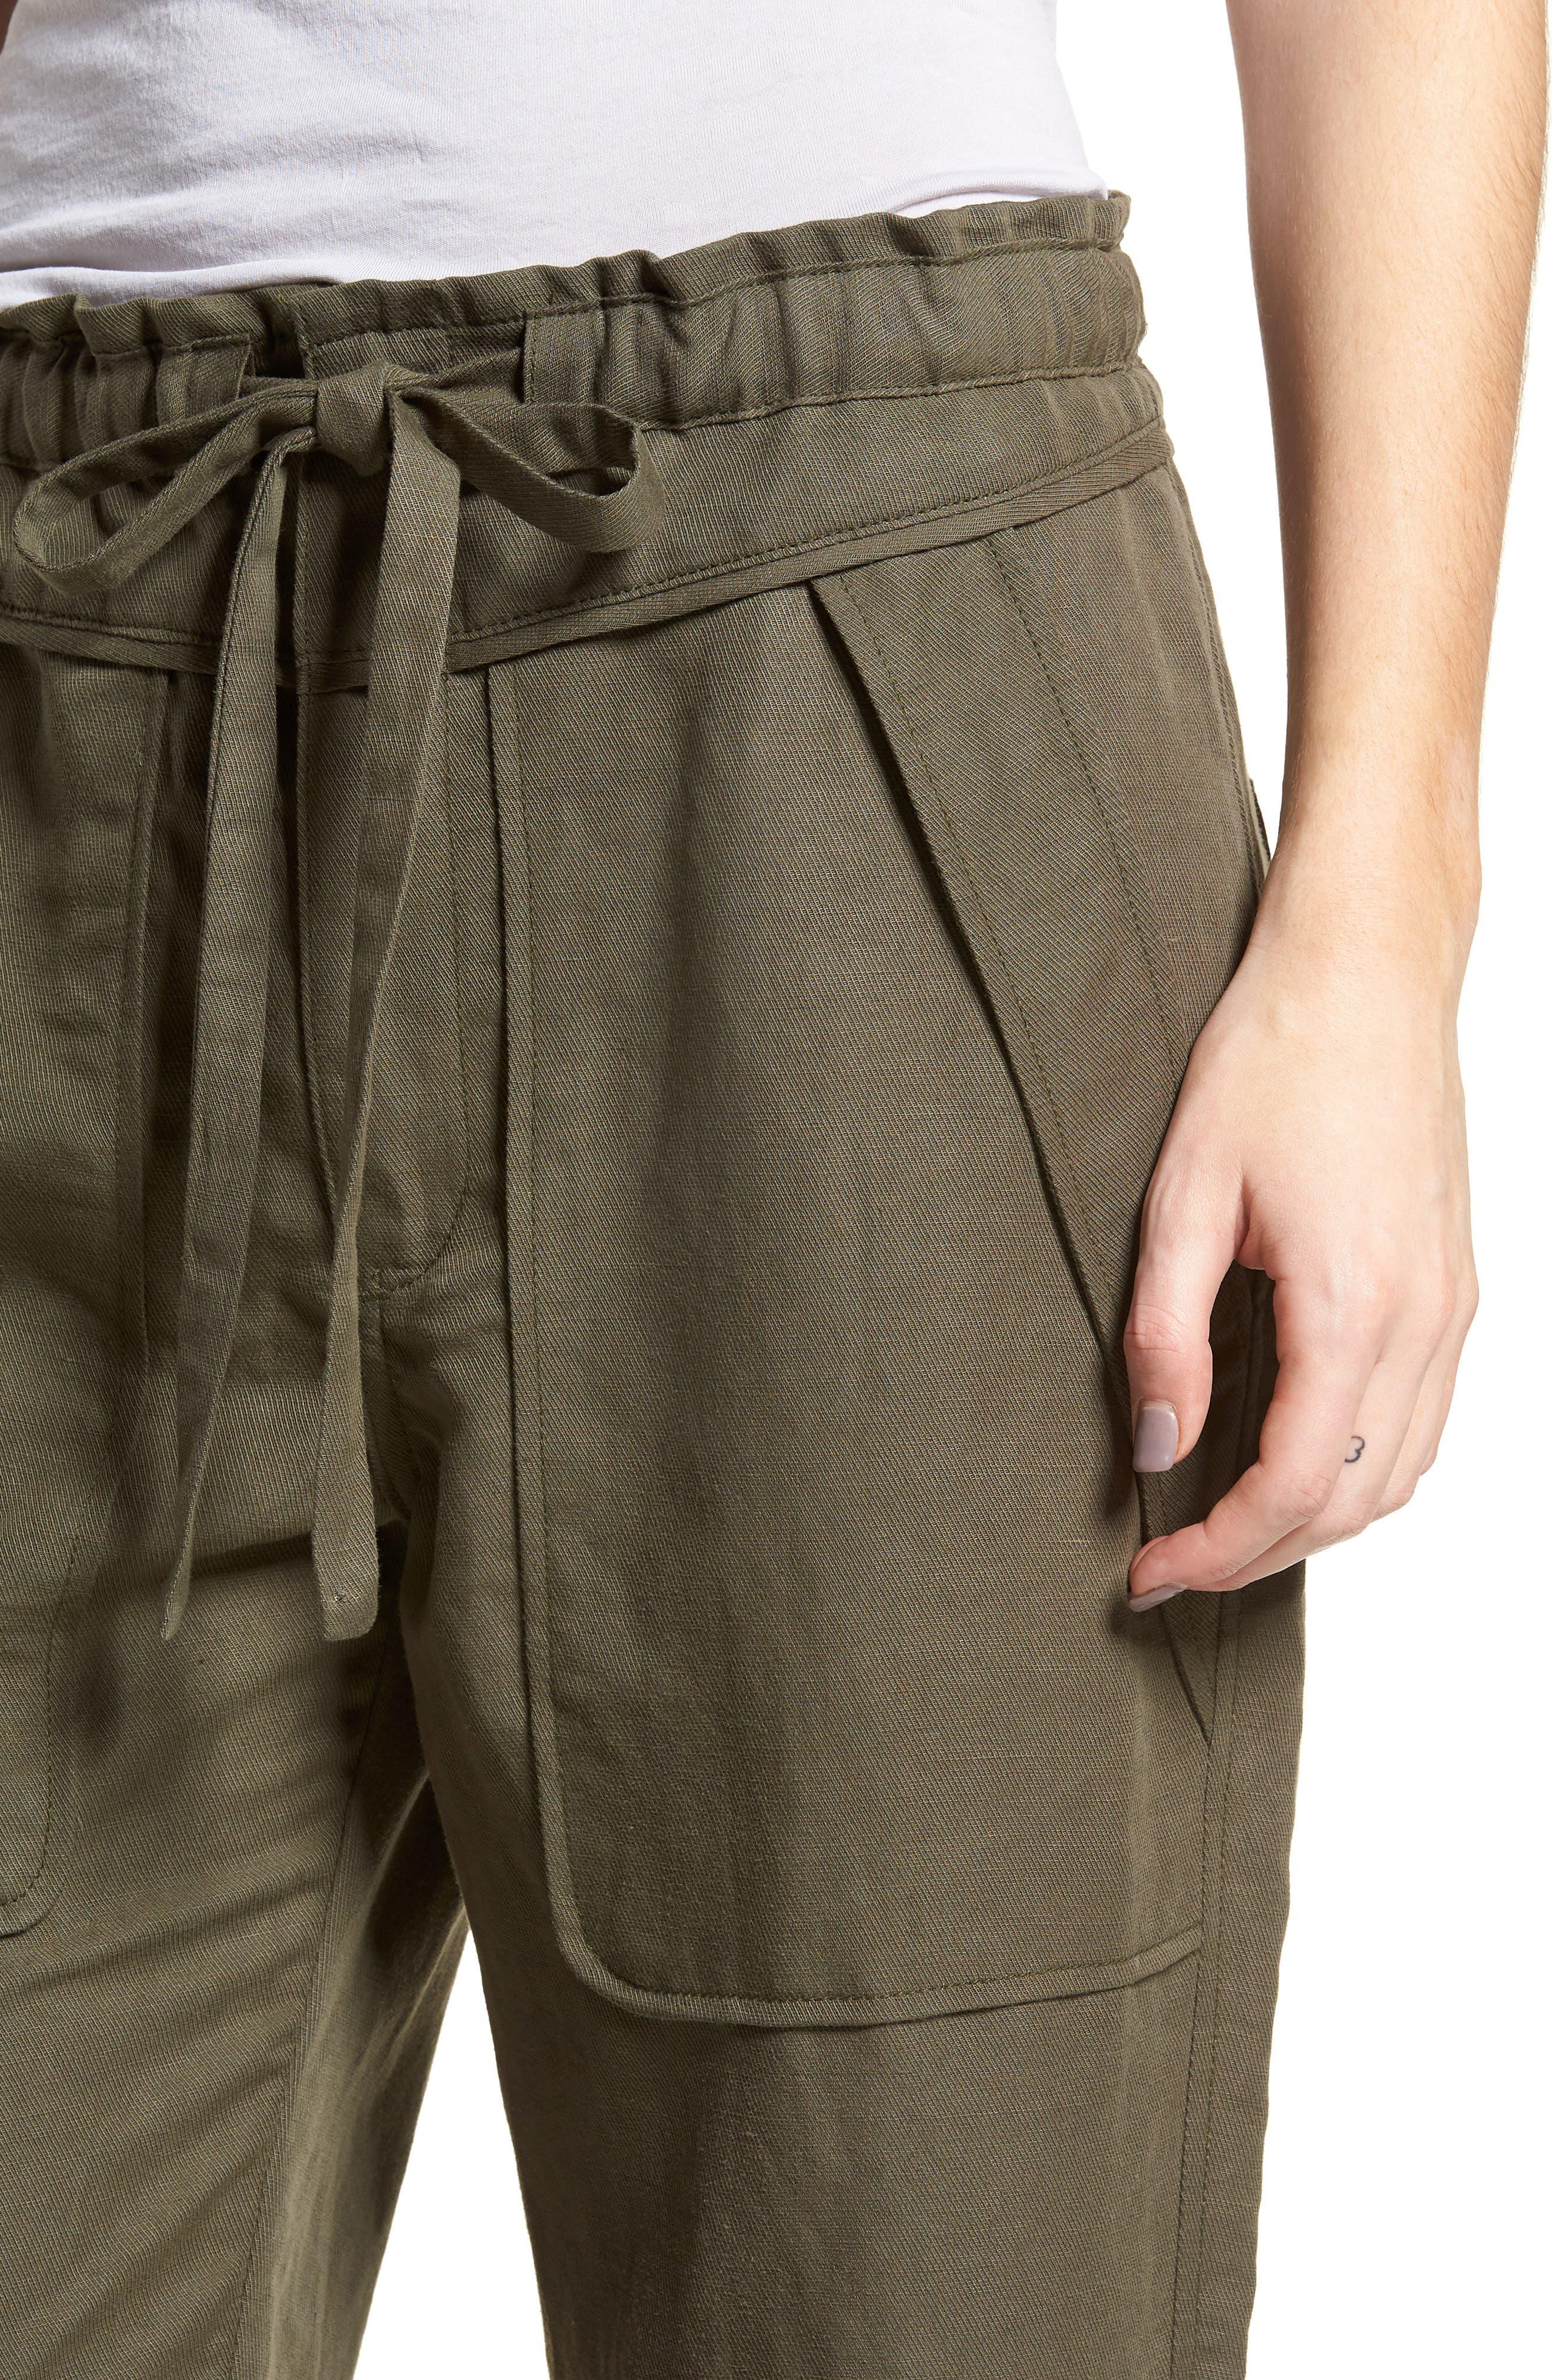 Stellina High Waist Pants,                             Alternate thumbnail 4, color,                             Verdant